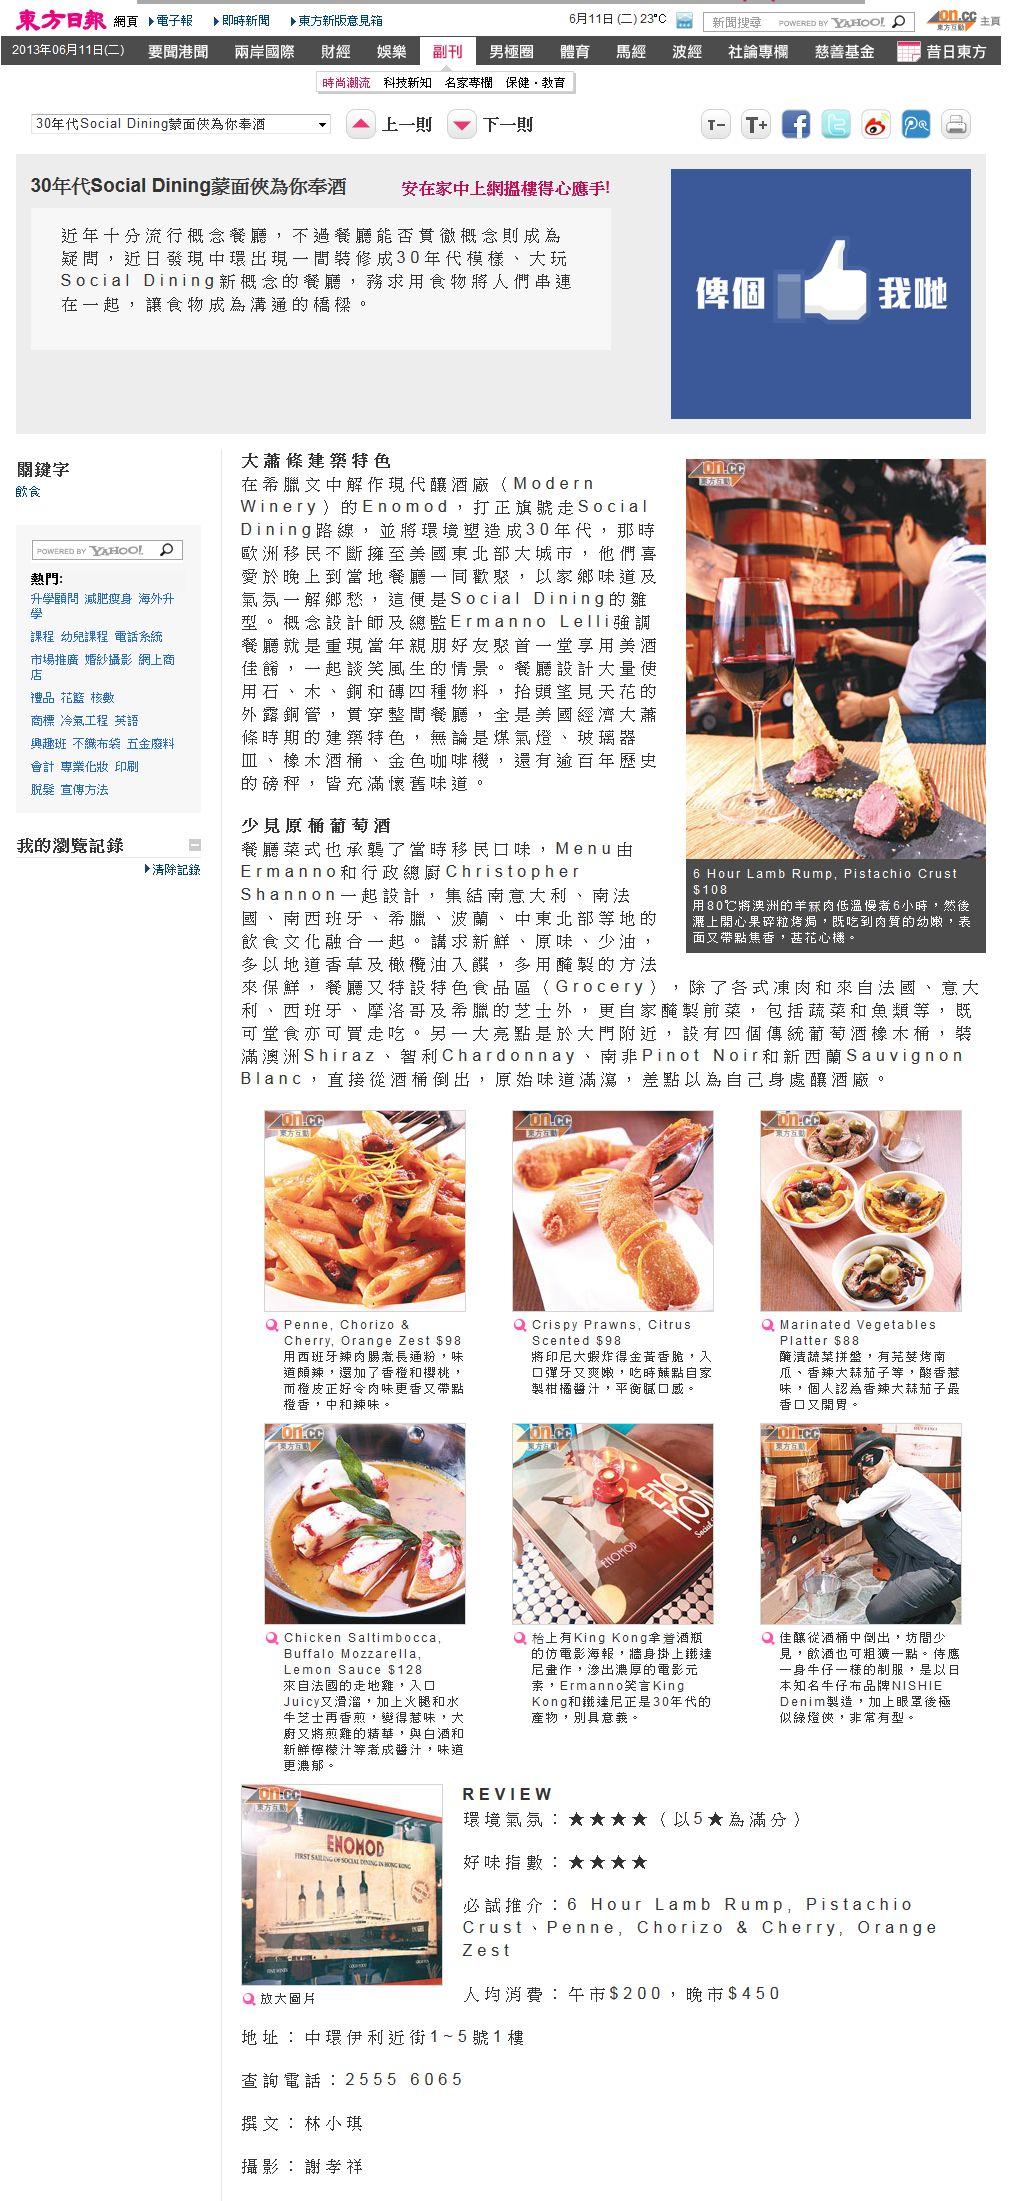 ENOMOD - 11.06 - Oriental Daily News (Online).jpg